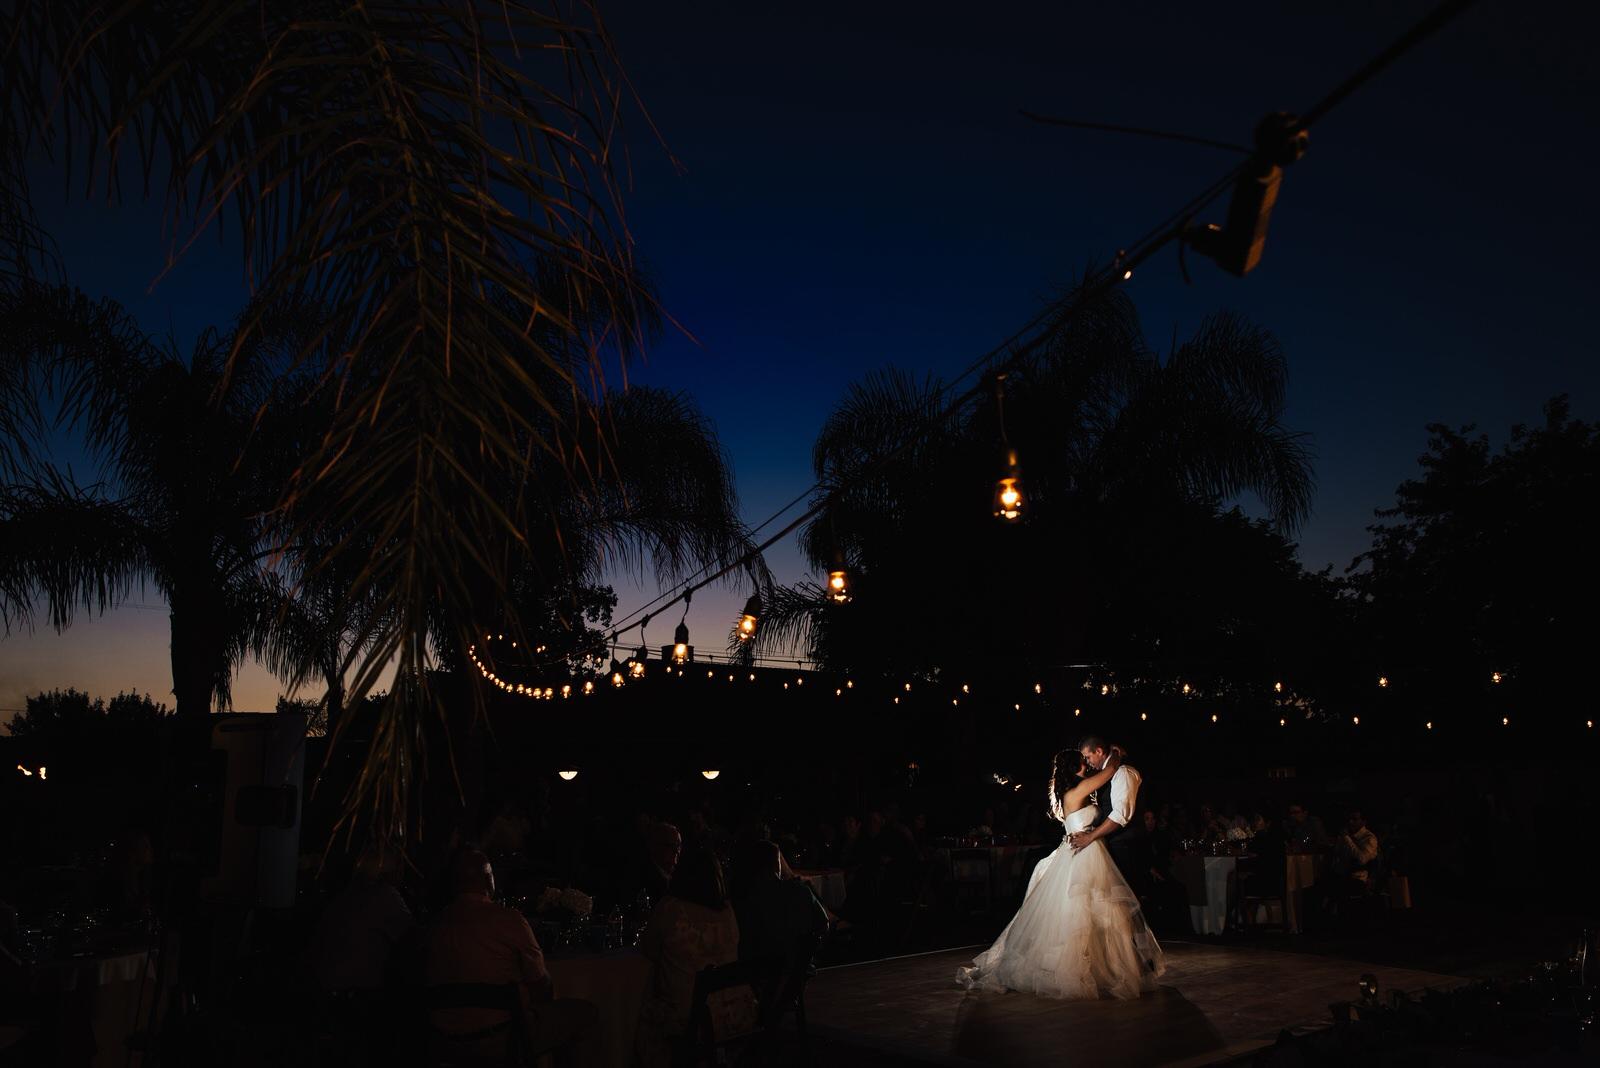 best-sacramento-wedding-portrait-photographer-jessica-roman-photography-18.jpg